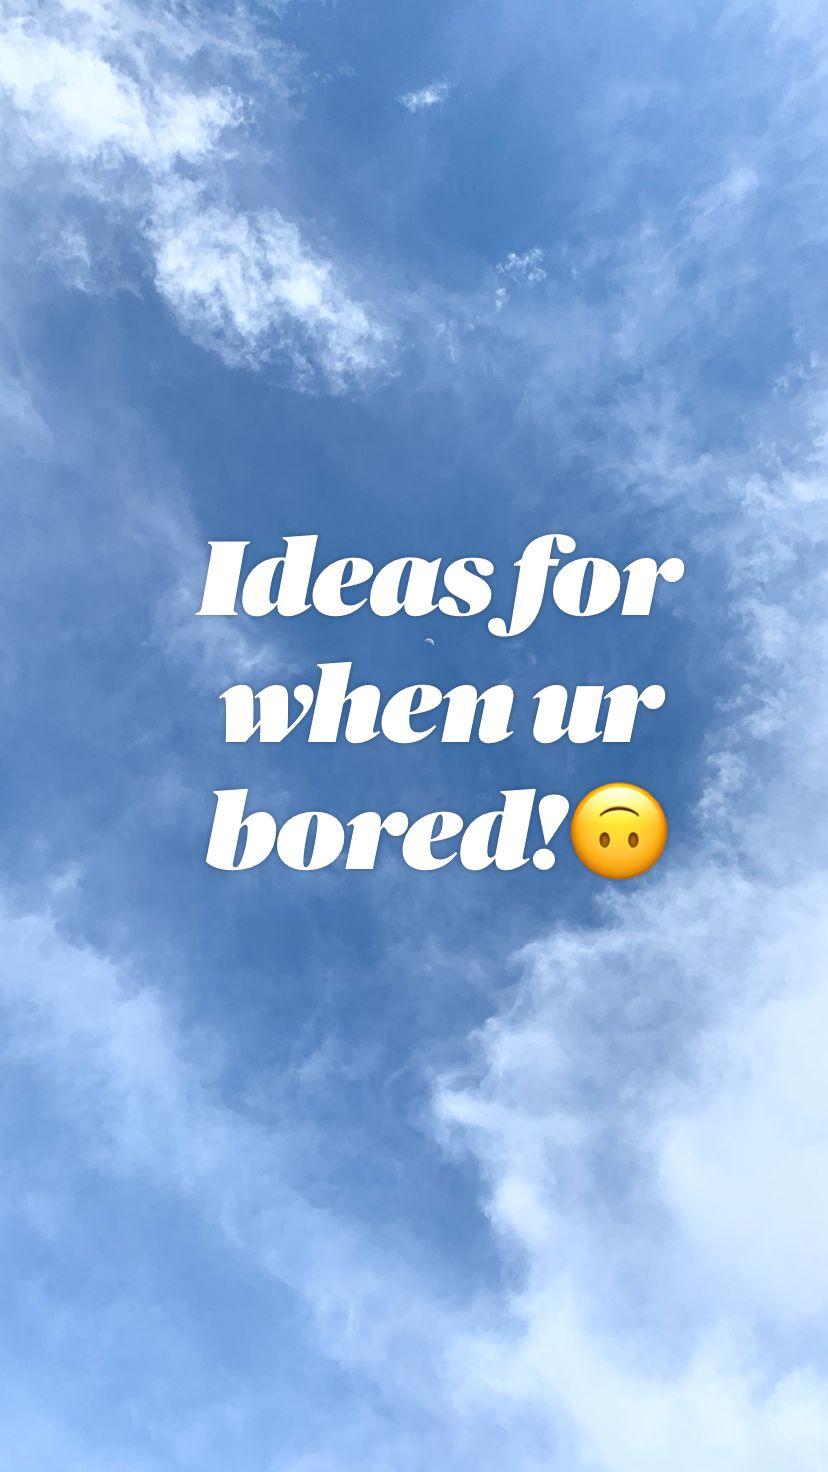 Ideas for when ur bored!🙃